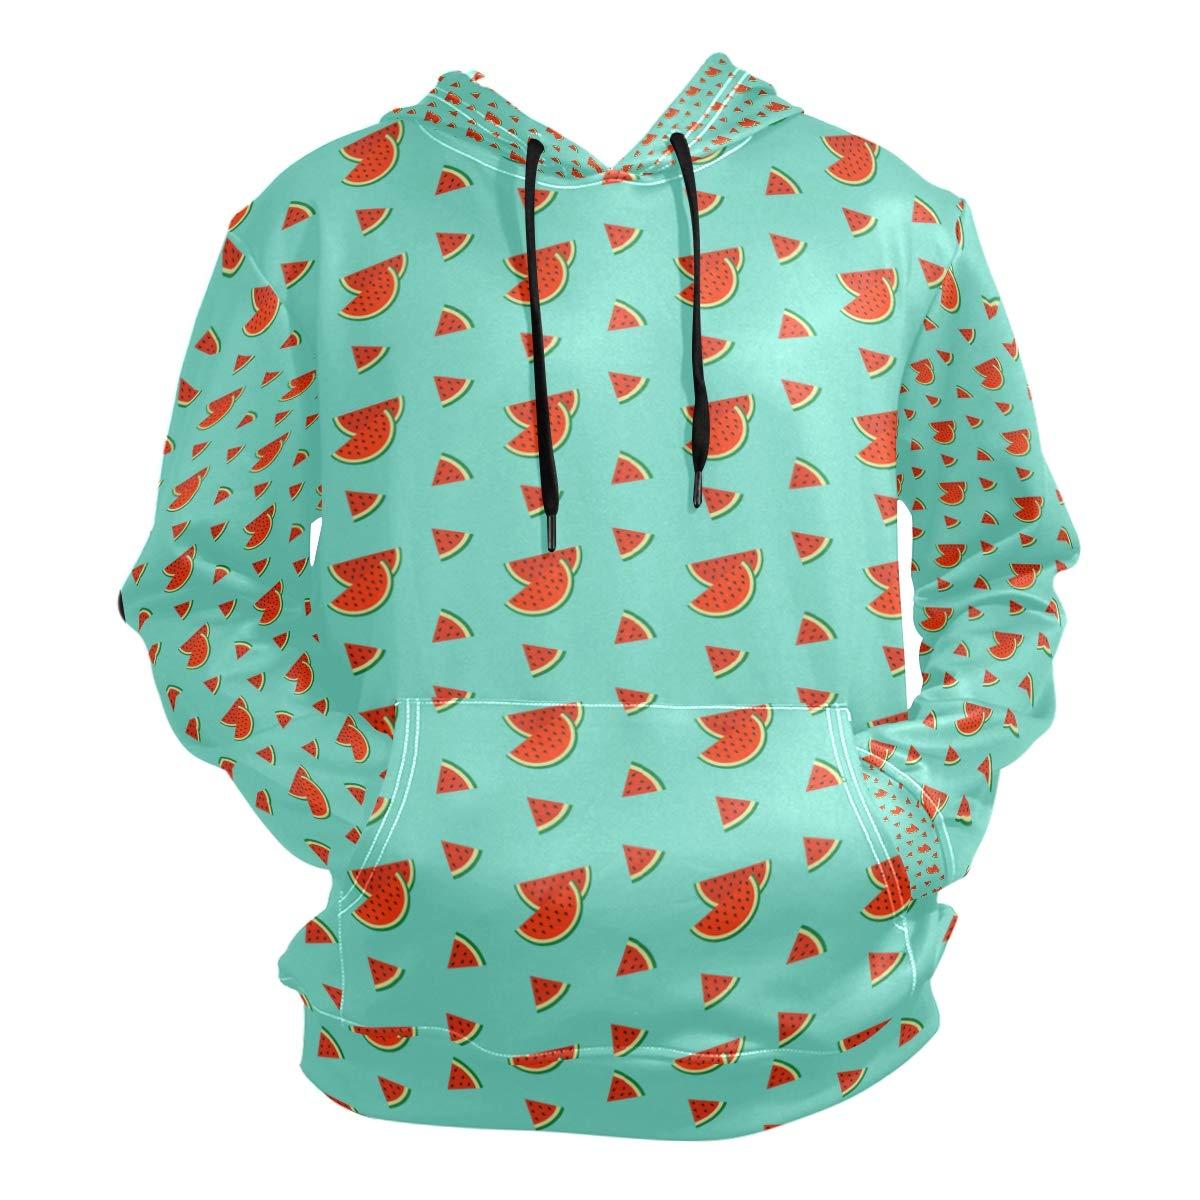 Mens Hooded Sweatshirt Watermelon Slice Print Green Pullover Fashion Hoodie Sweater